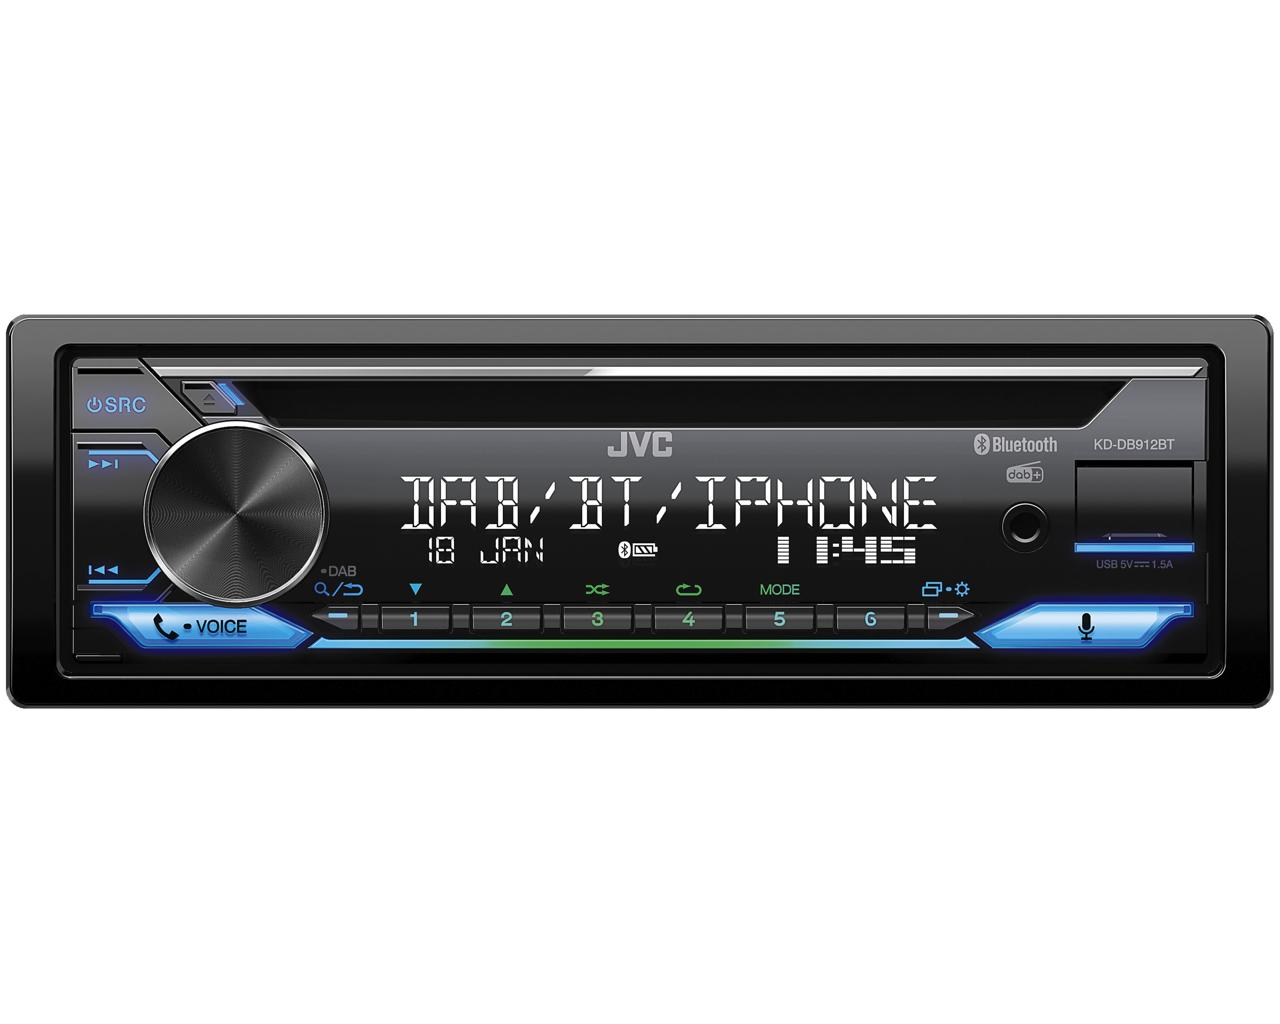 JVC DAB / FM autorádio s CD/Bluetooth/USB/AUX/odním.panel/multicolor